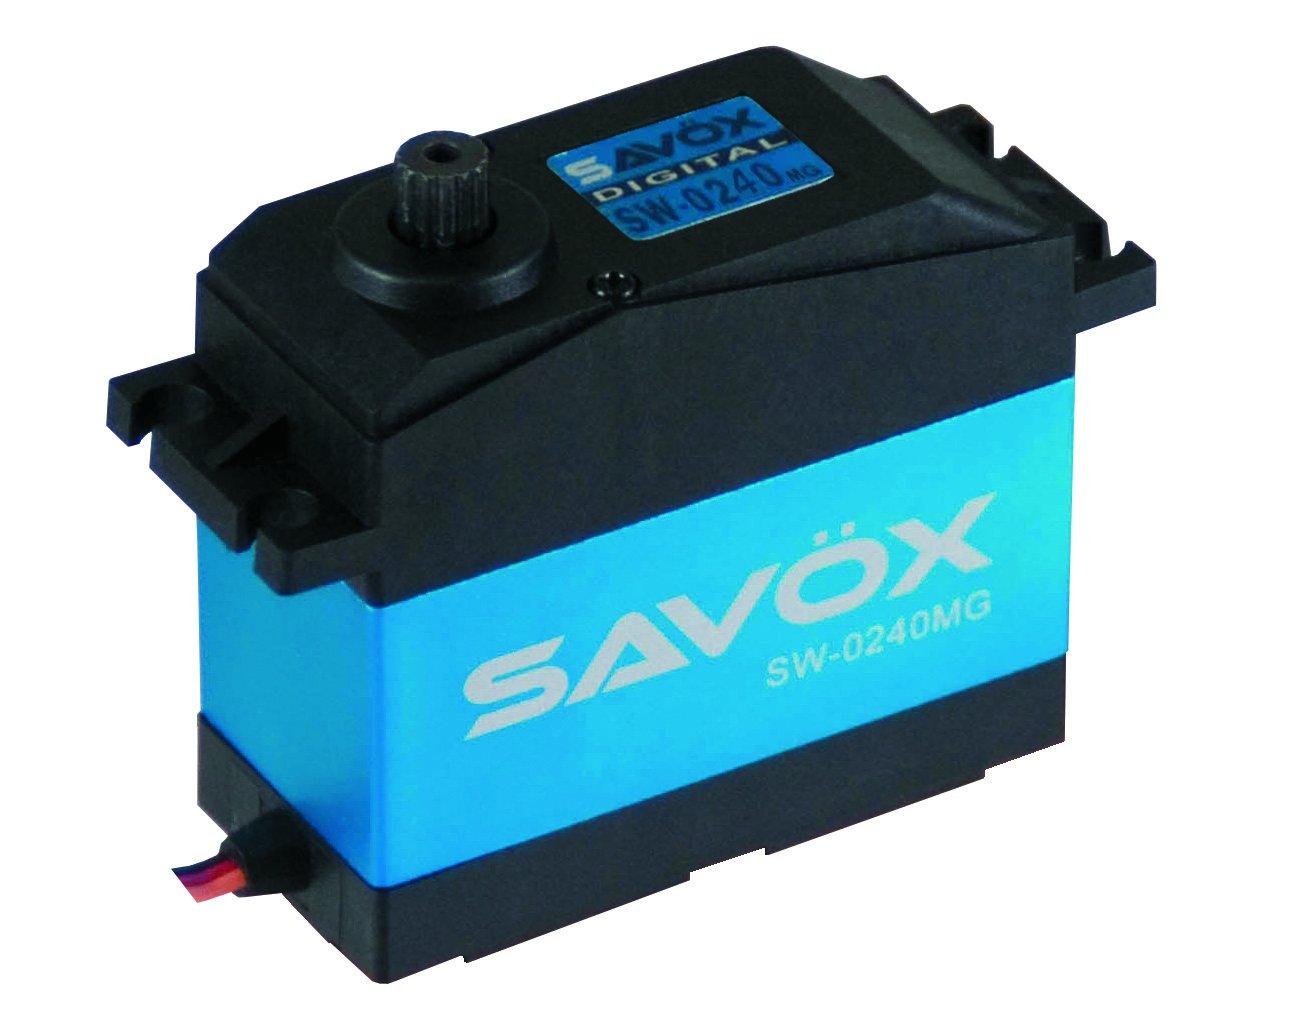 Savöx SW0240MG Waterproof 5th Scale Digital Servo